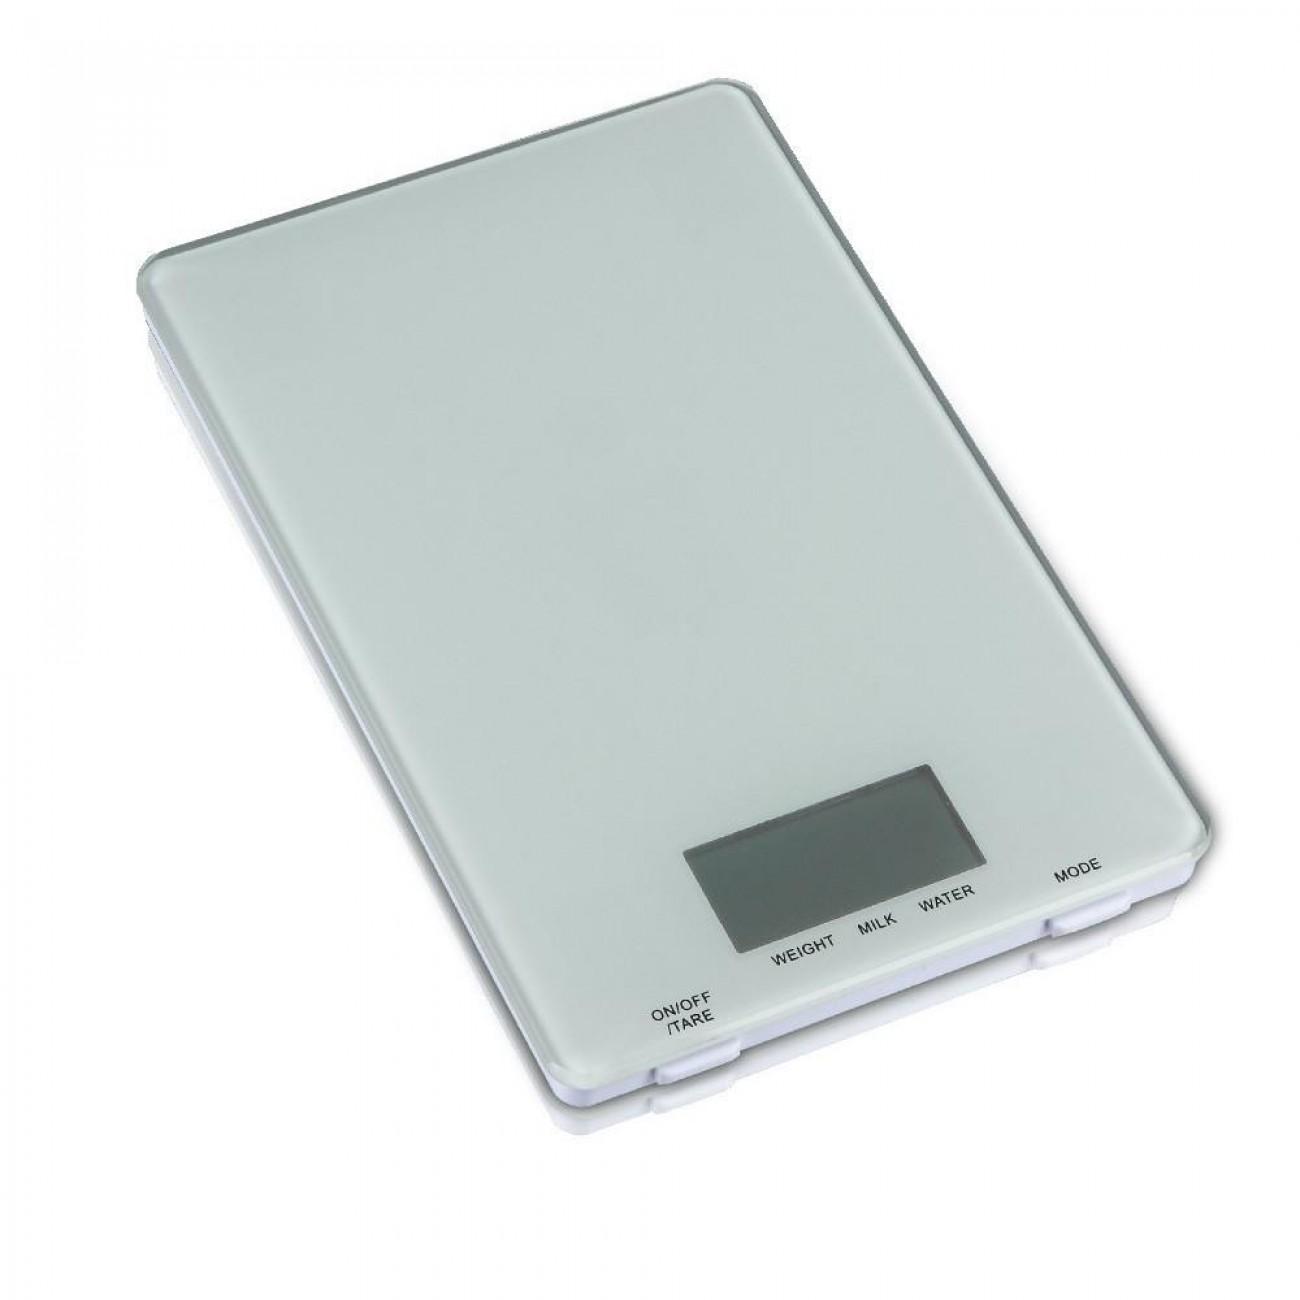 Кухненска електронна везна SAPIR SP 1651 J, Вкл. батерия, LCD екран в Кухненски везни - SAPIR | Alleop